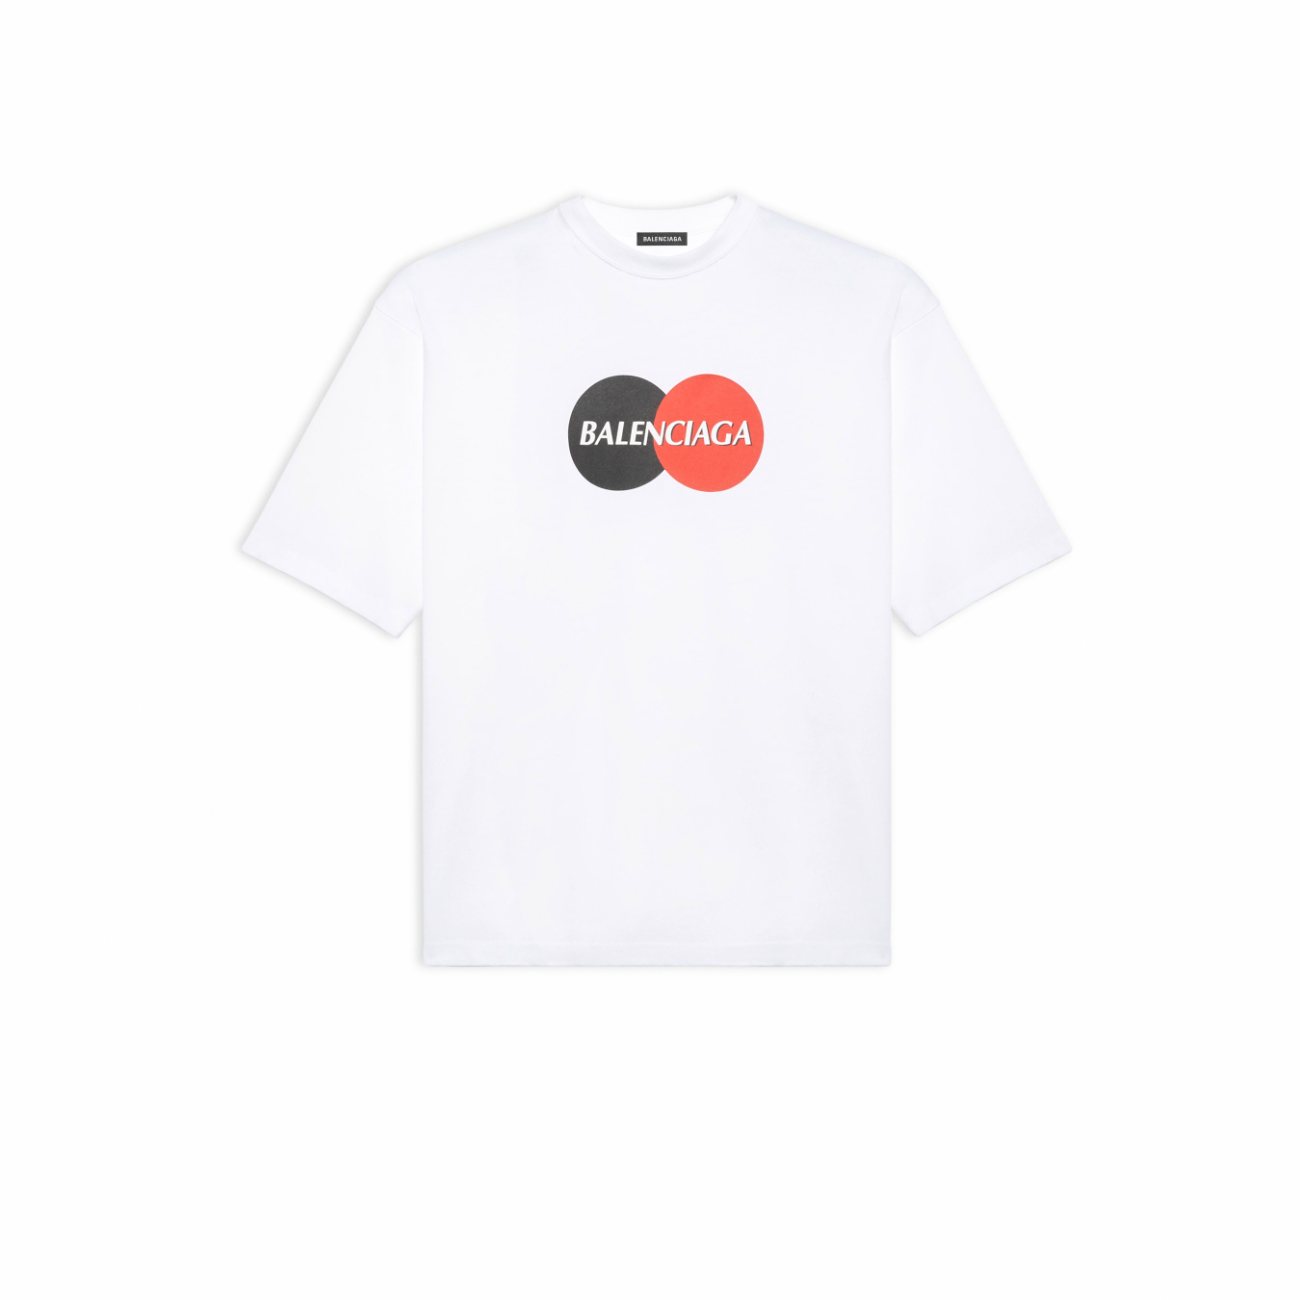 Balenciaga 발렌시아가 620969TIV799000 유니폼 라지 핏 남성 티셔츠-19-4712717037